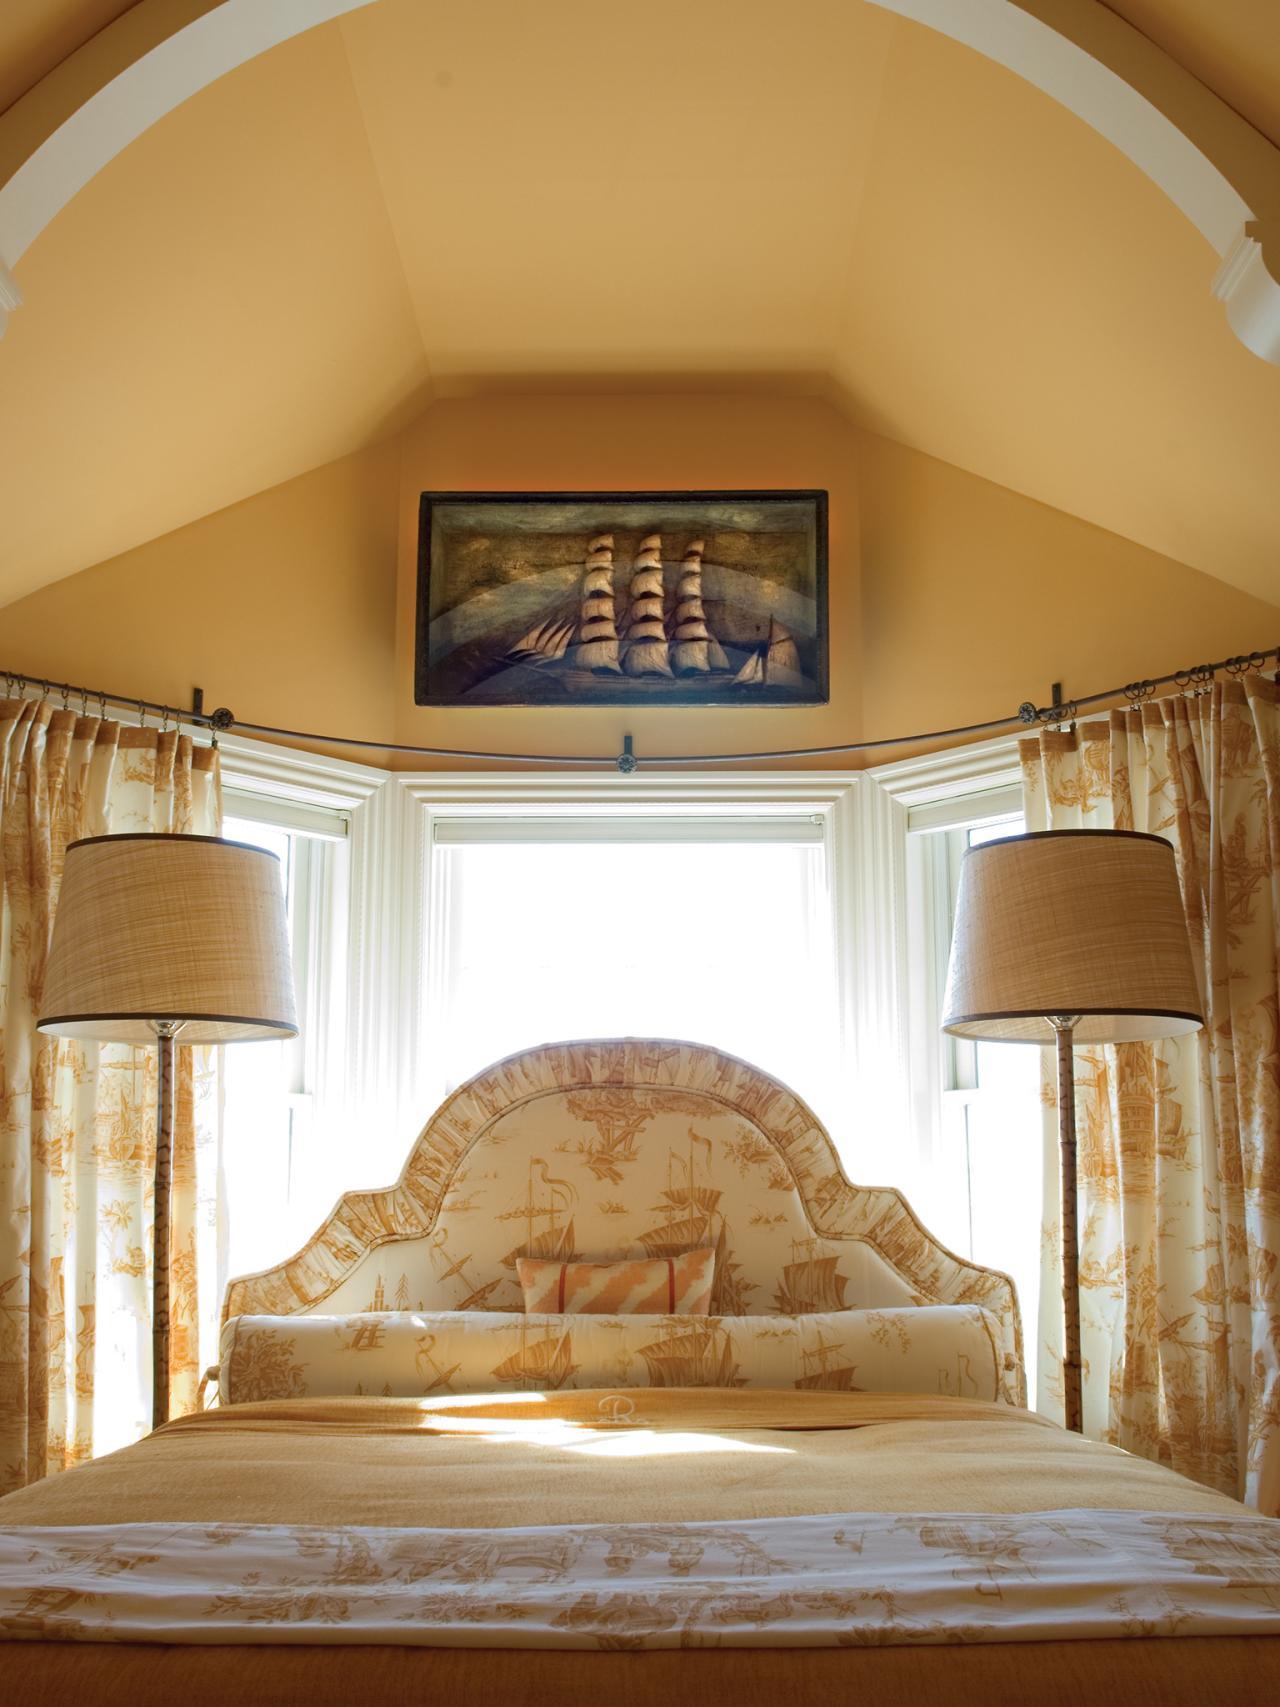 photos hgtv. Black Bedroom Furniture Sets. Home Design Ideas